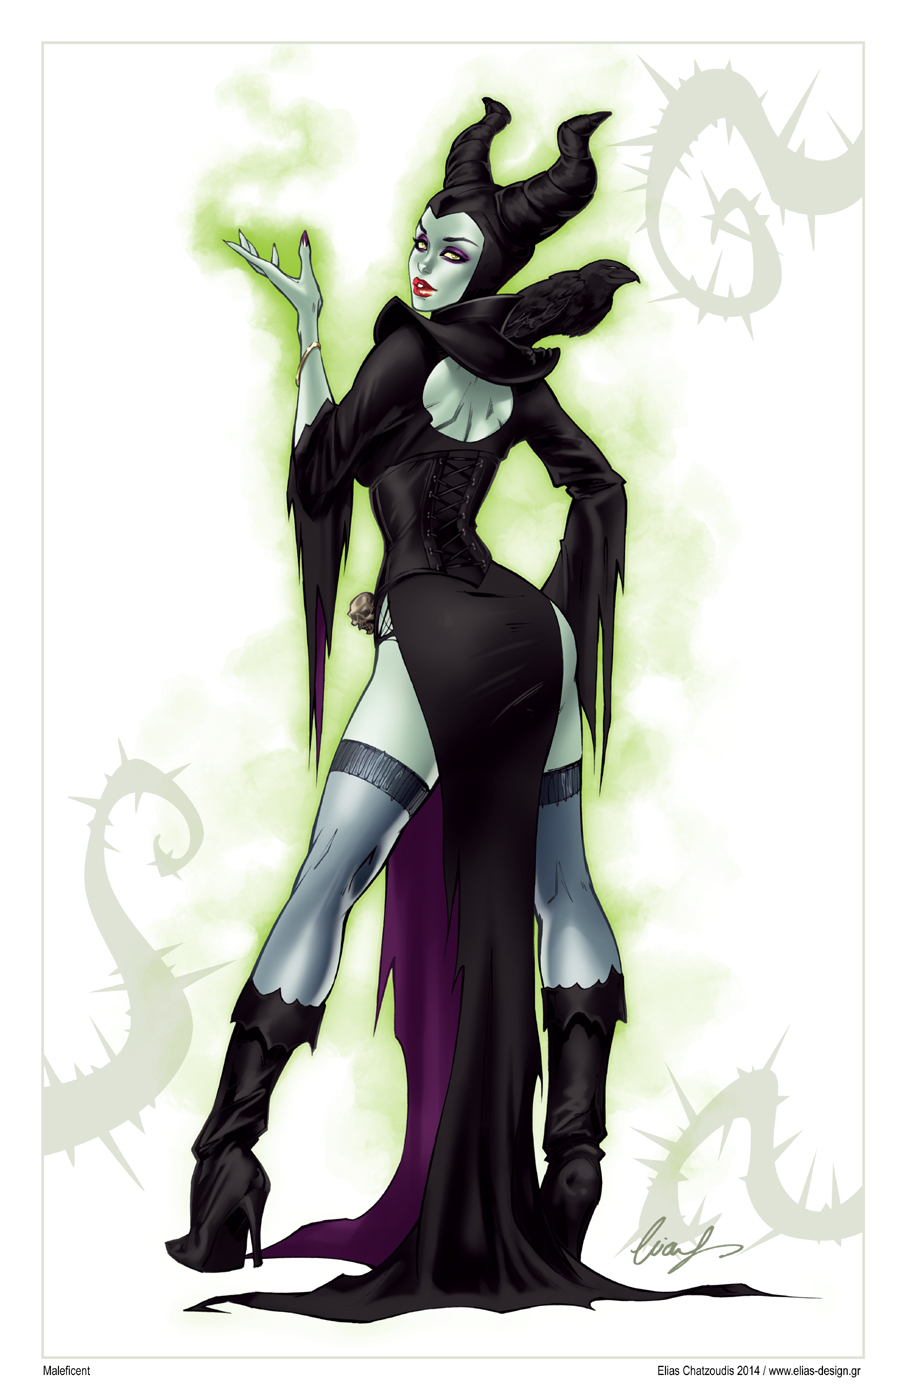 Maleficent by Elias-Chatzoudis